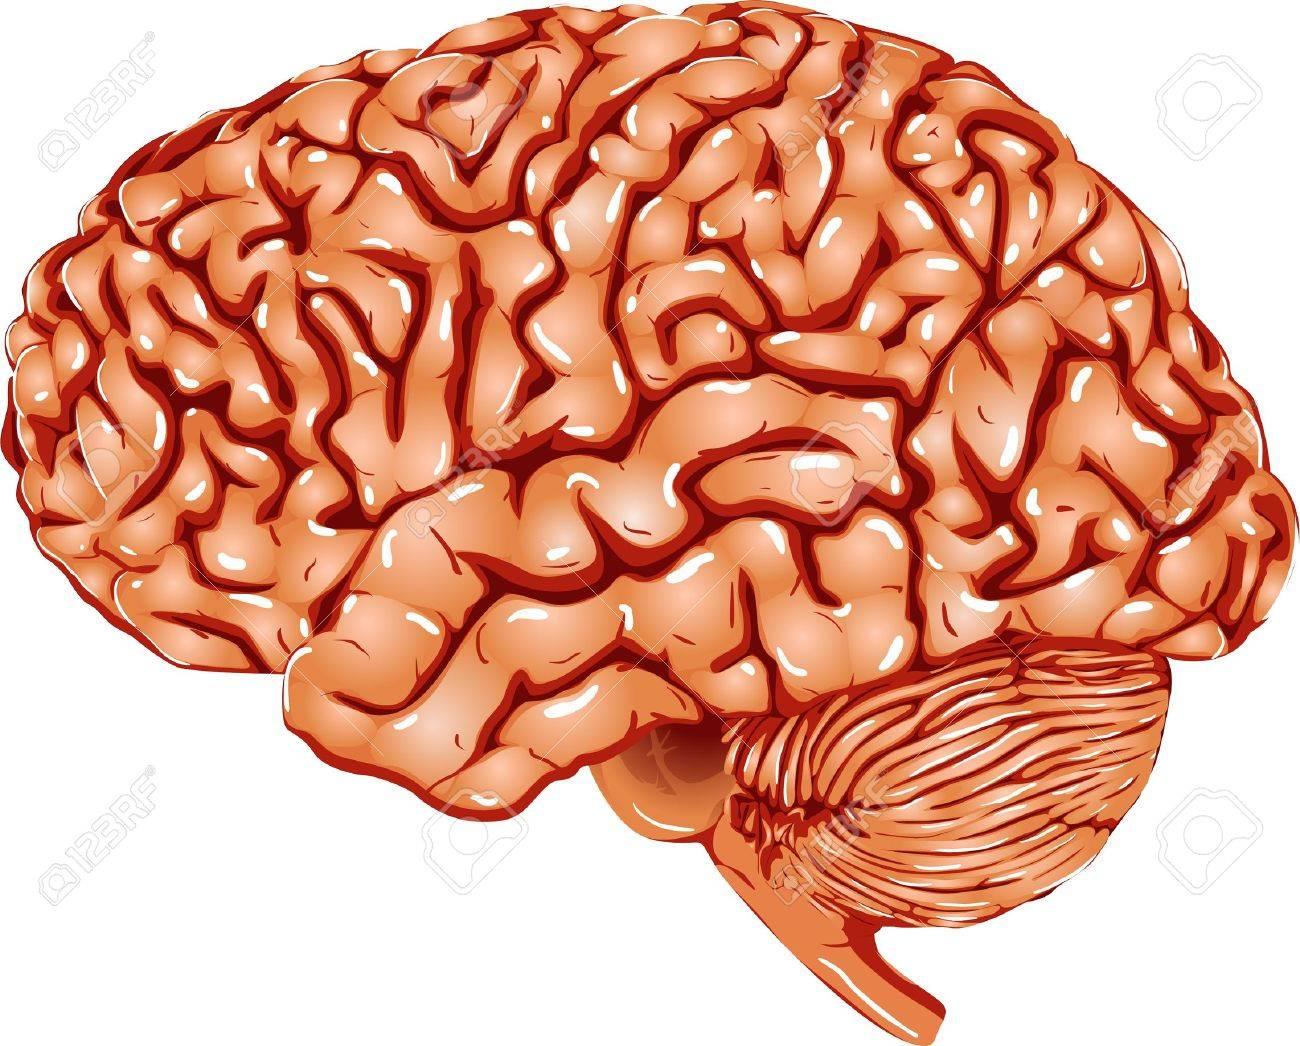 Human Brain Stock Vector - 13699571